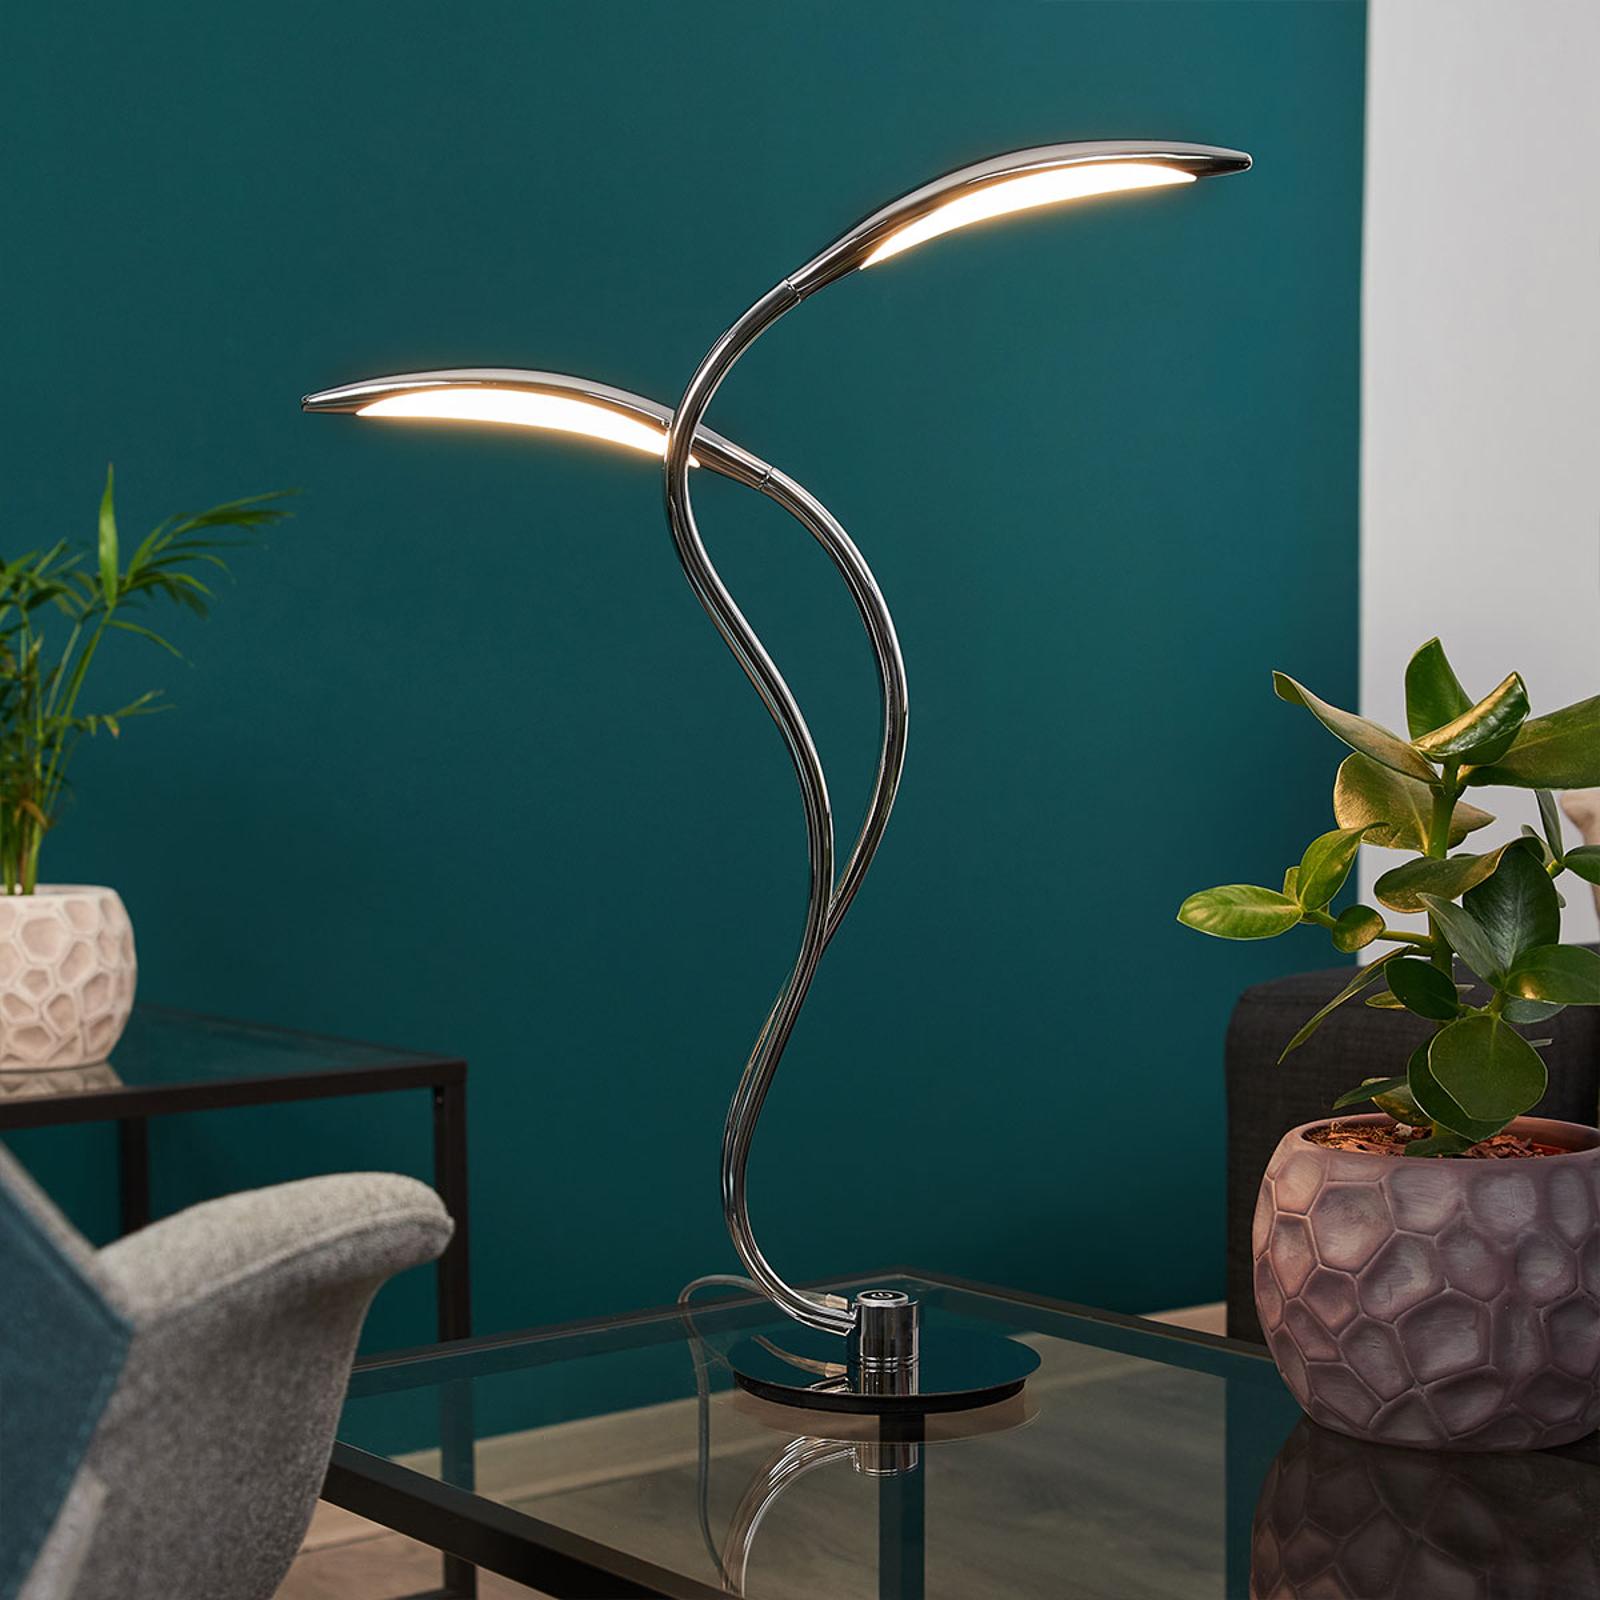 LED-Tischlampe Hampton, dimmbar, chrom, 2-flammig